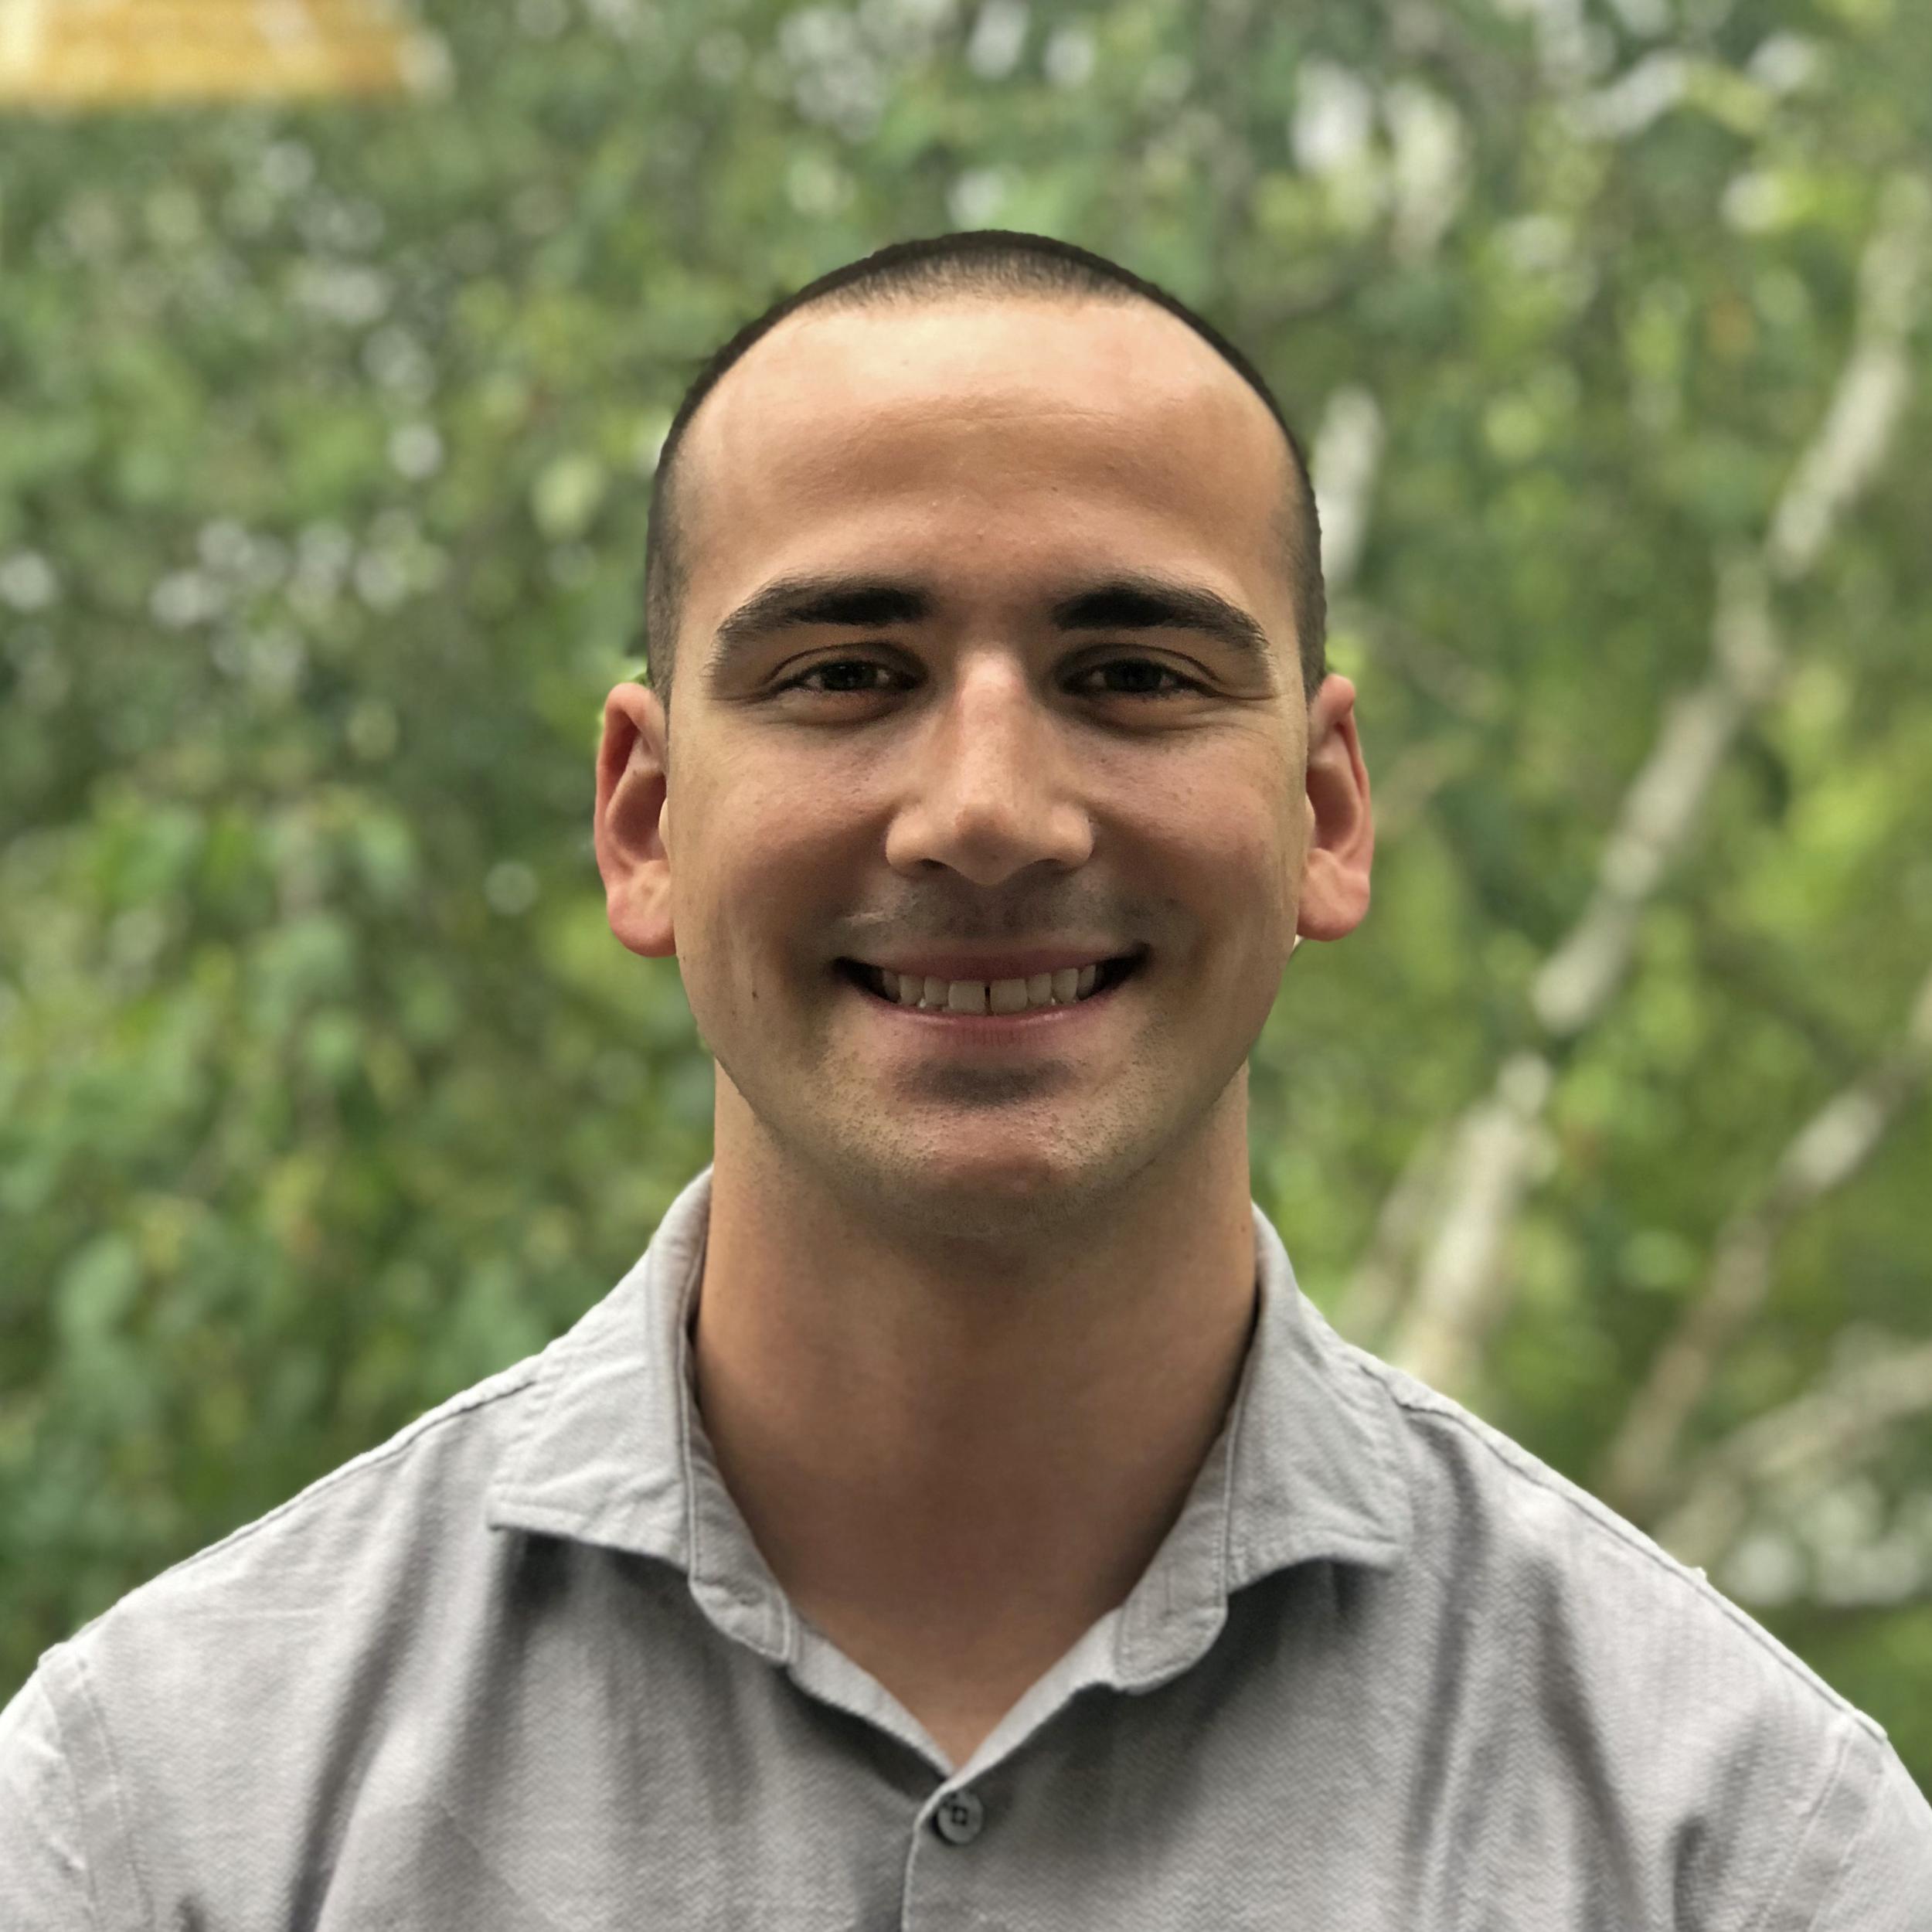 Nick Sautter - Clinical Subjects Coordinator